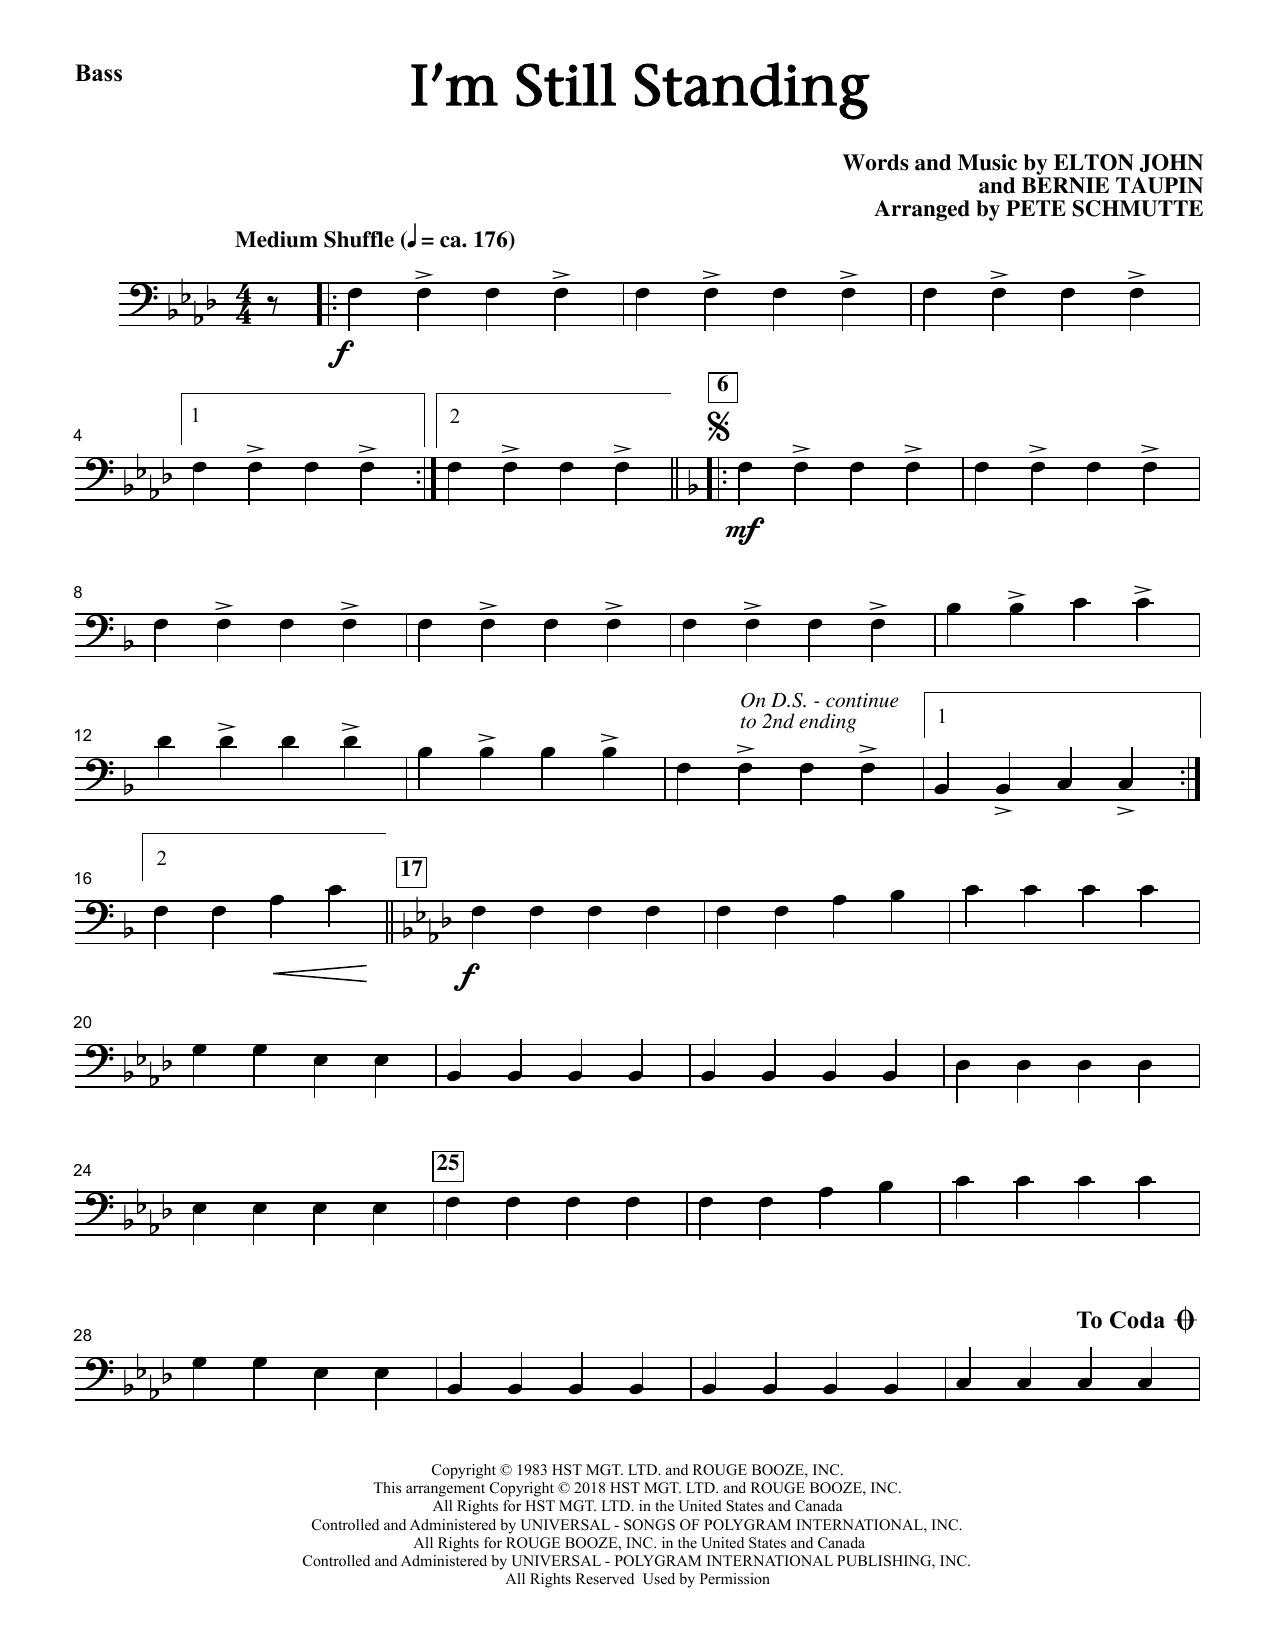 Elton John I'm Still Standing (arr. Pete Schmutte) - Bass sheet music notes printable PDF score